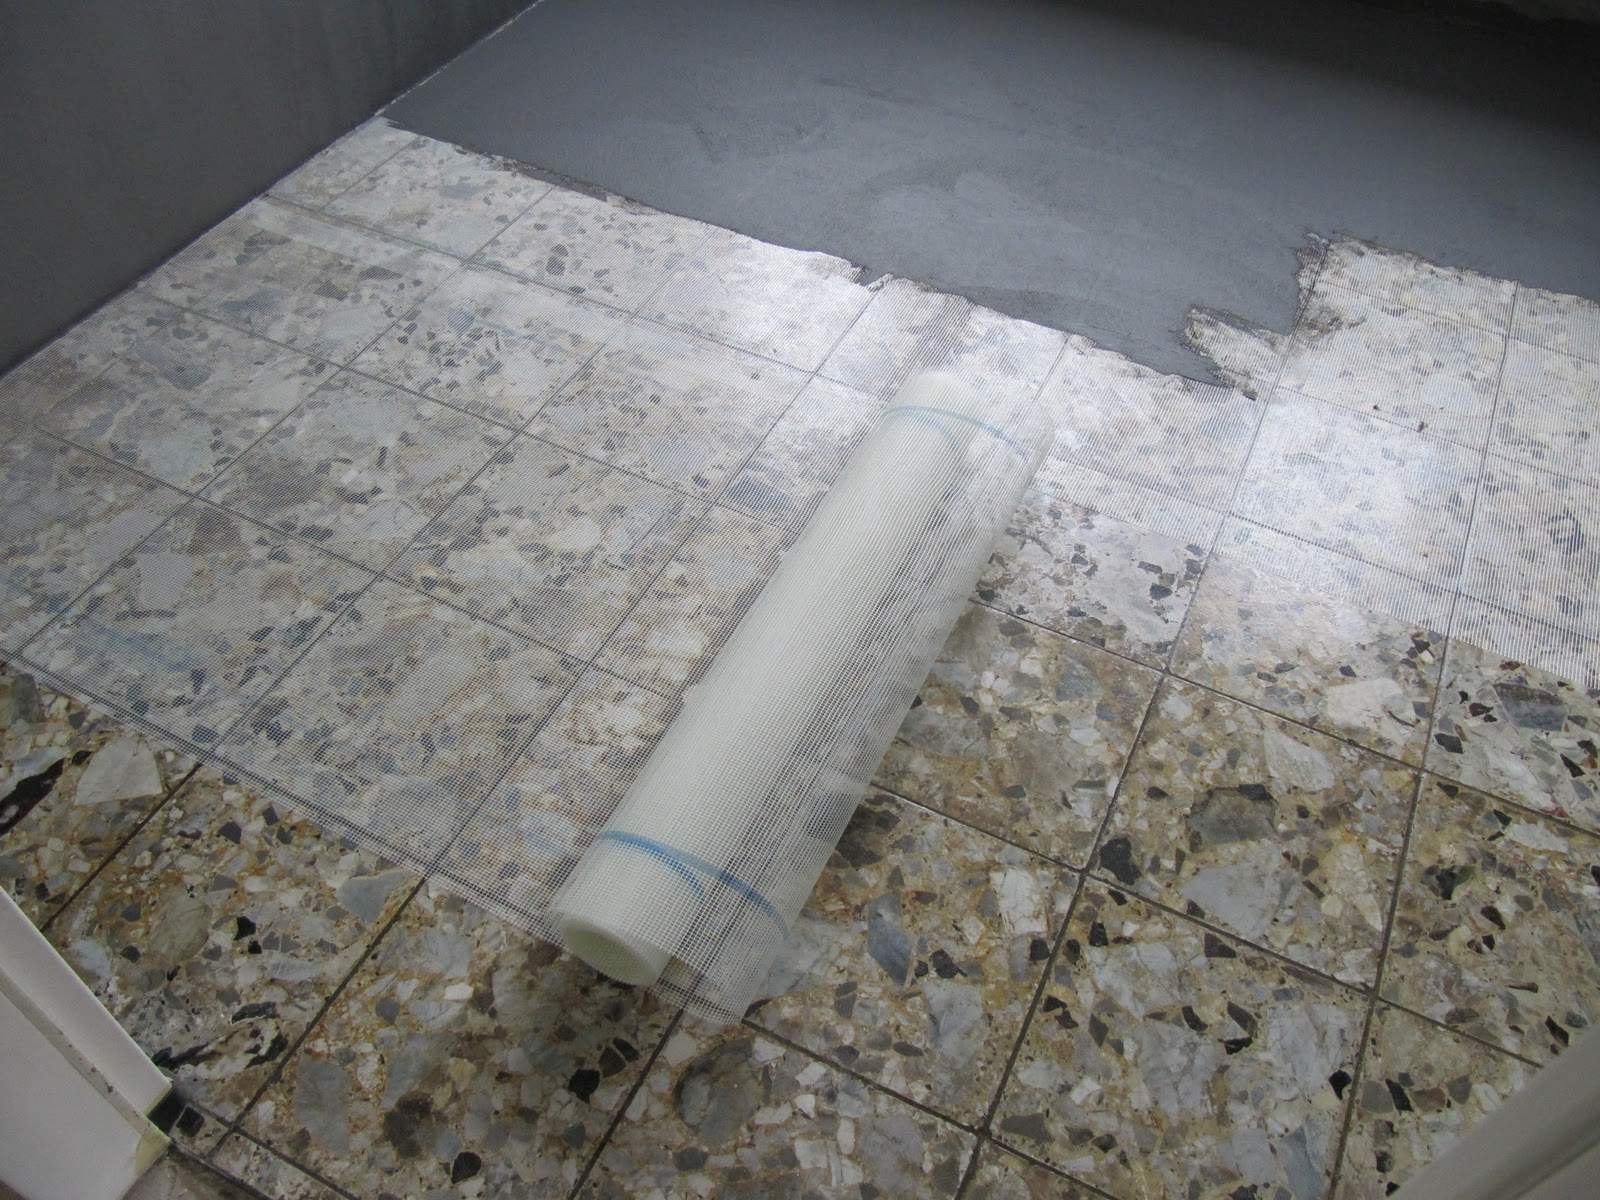 Beton unique beton cire beton cire - Beton cire millimetrique ...